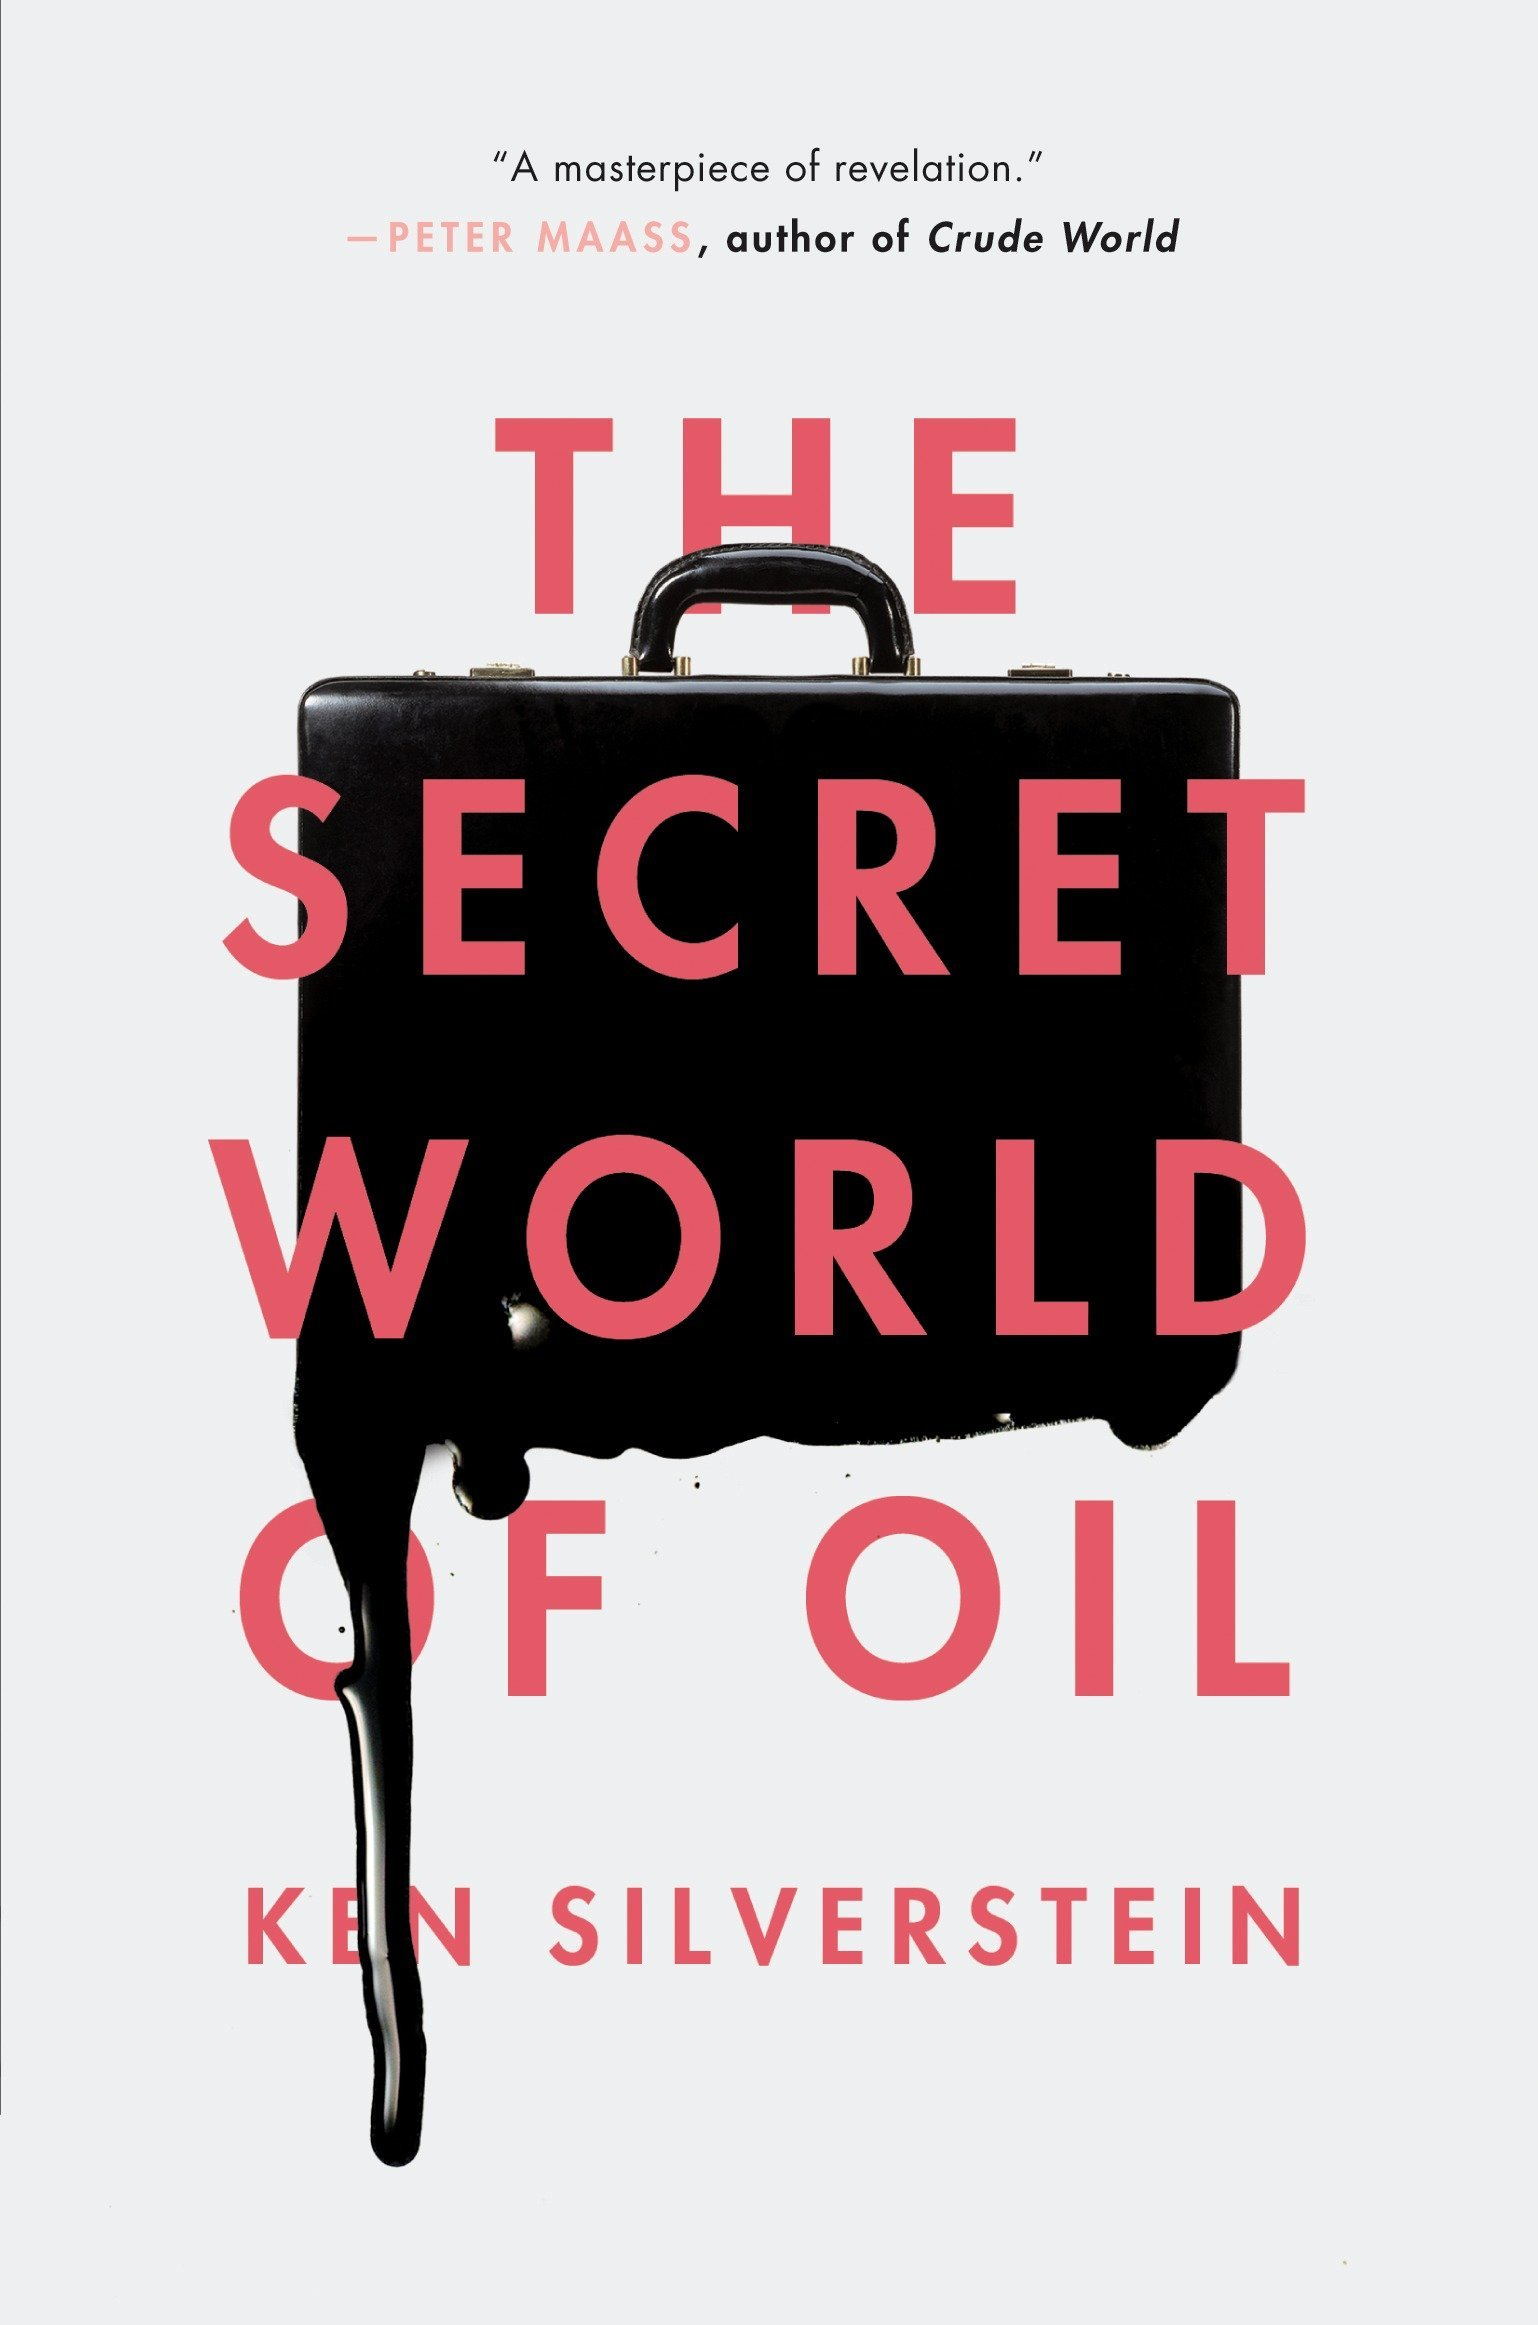 The Secret World of Oil: Ken Silverstein: 9781781688670: Amazon com